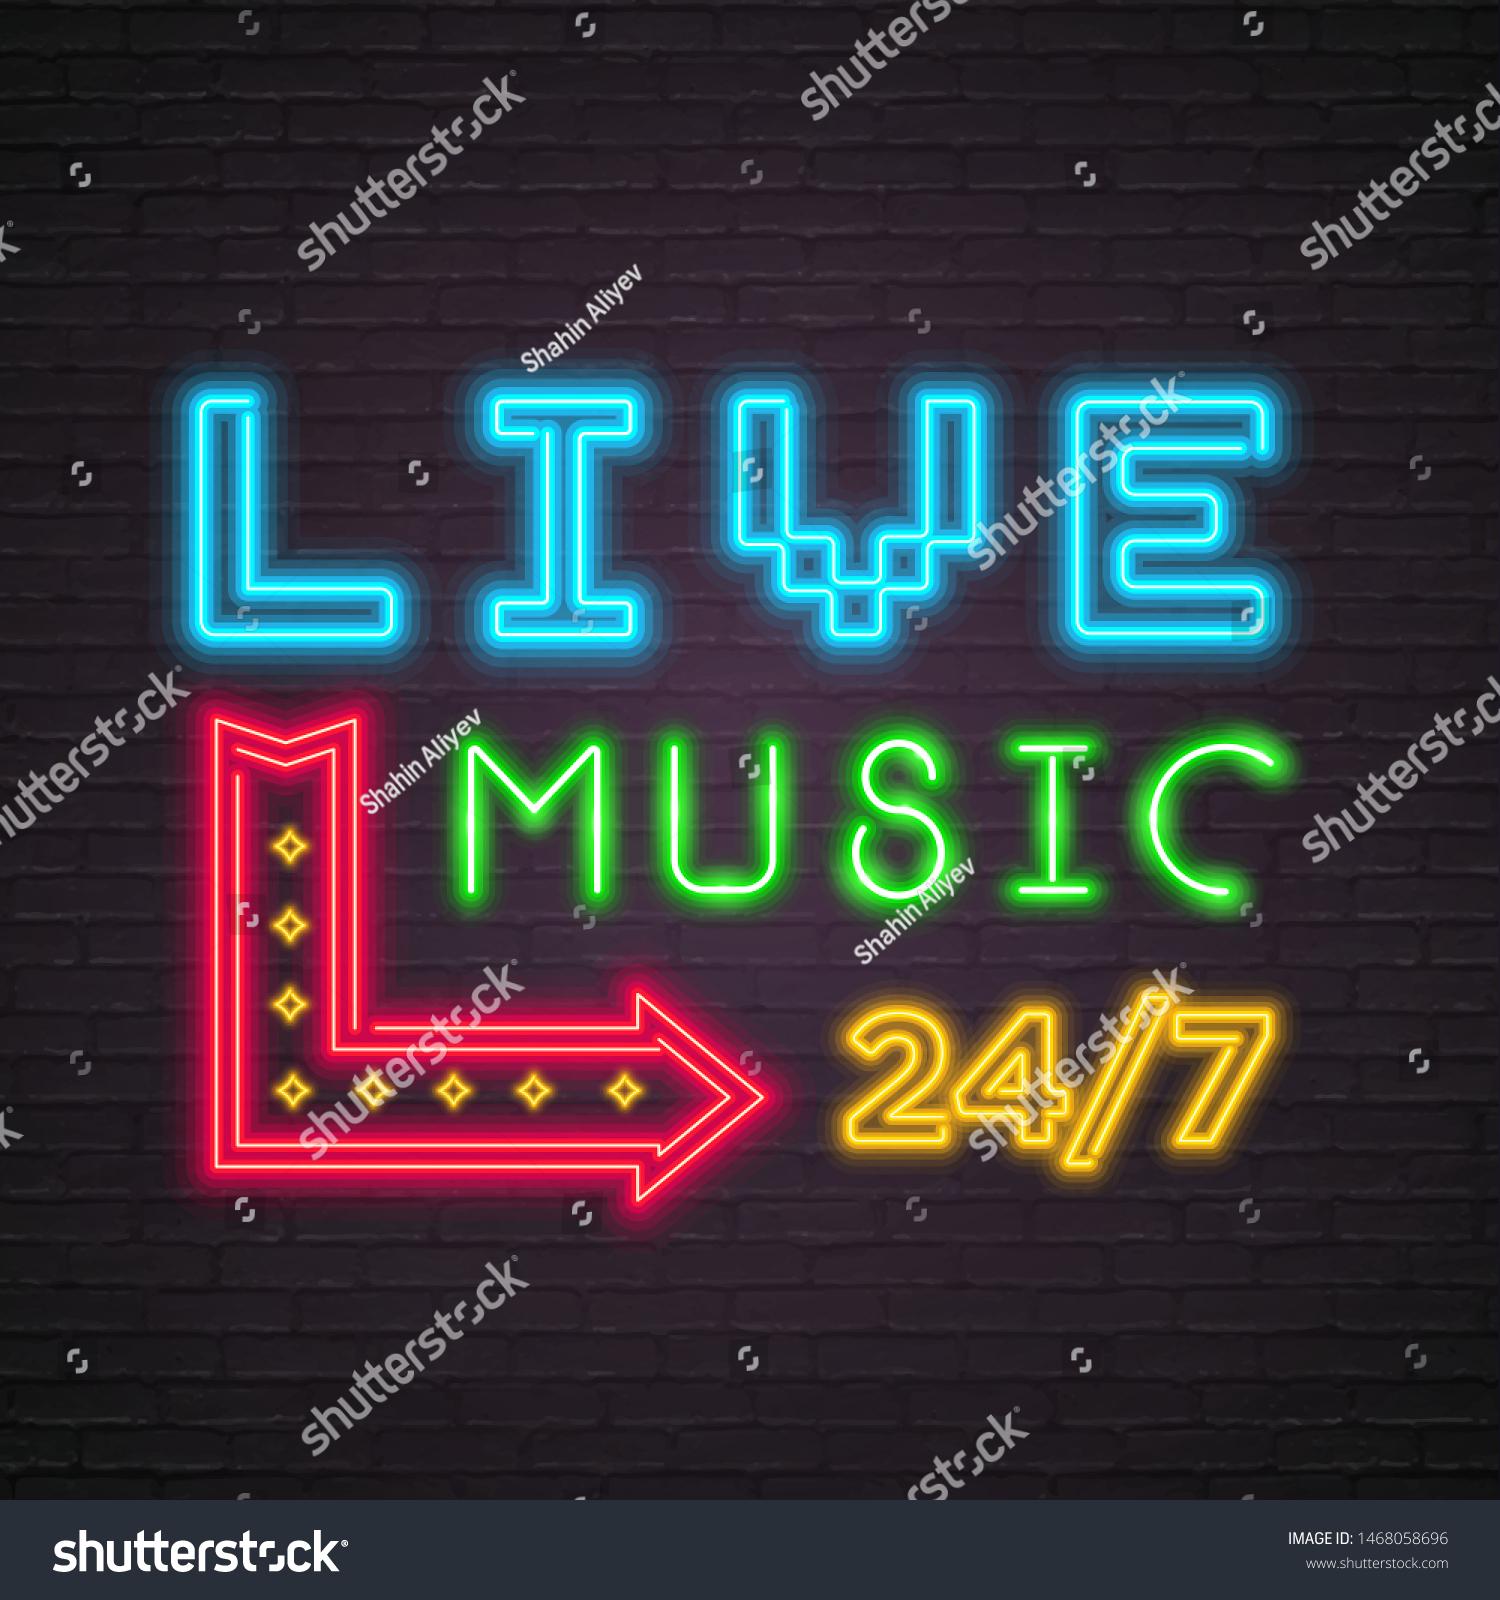 MUSIC 24/7